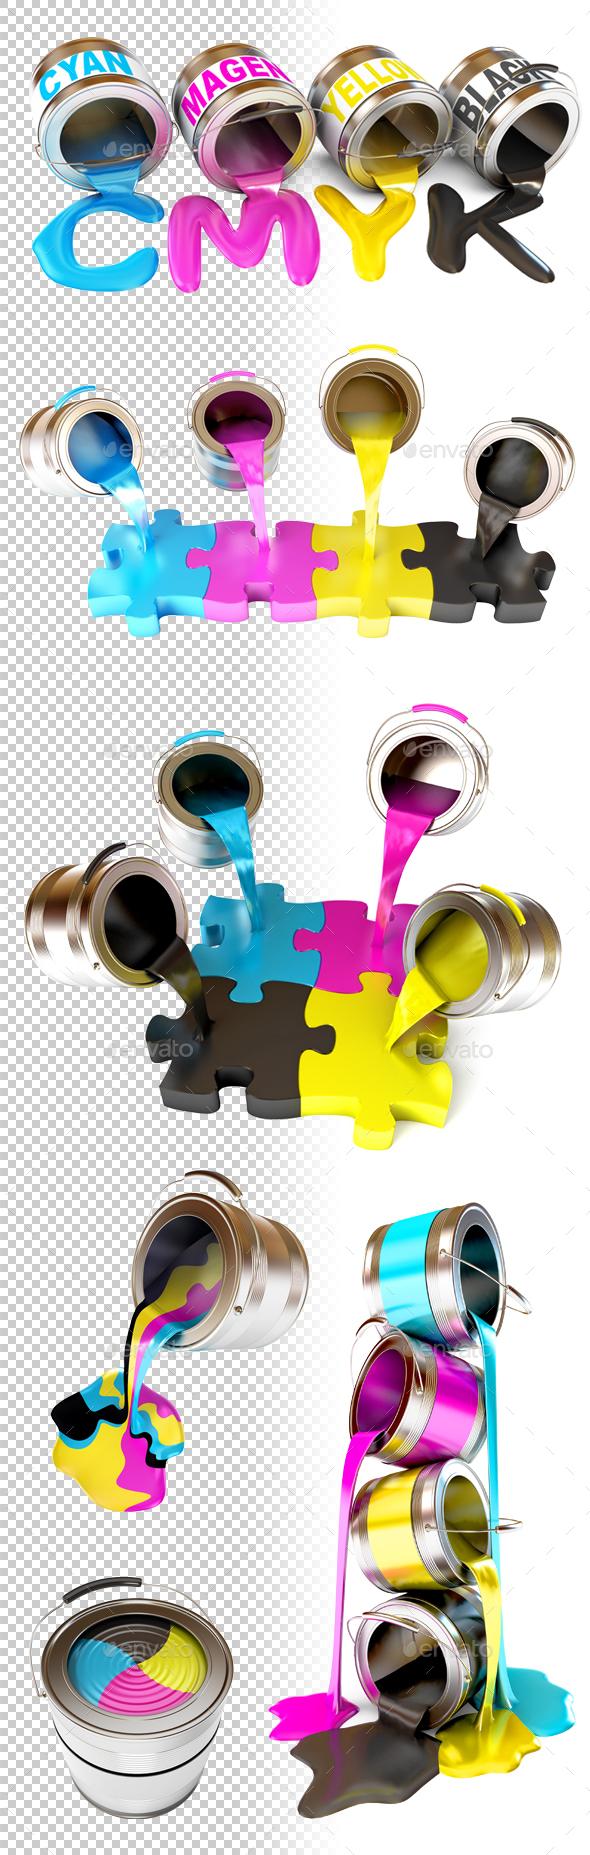 Bottles of ink in cmyk colors. 3d render. - Miscellaneous 3D Renders